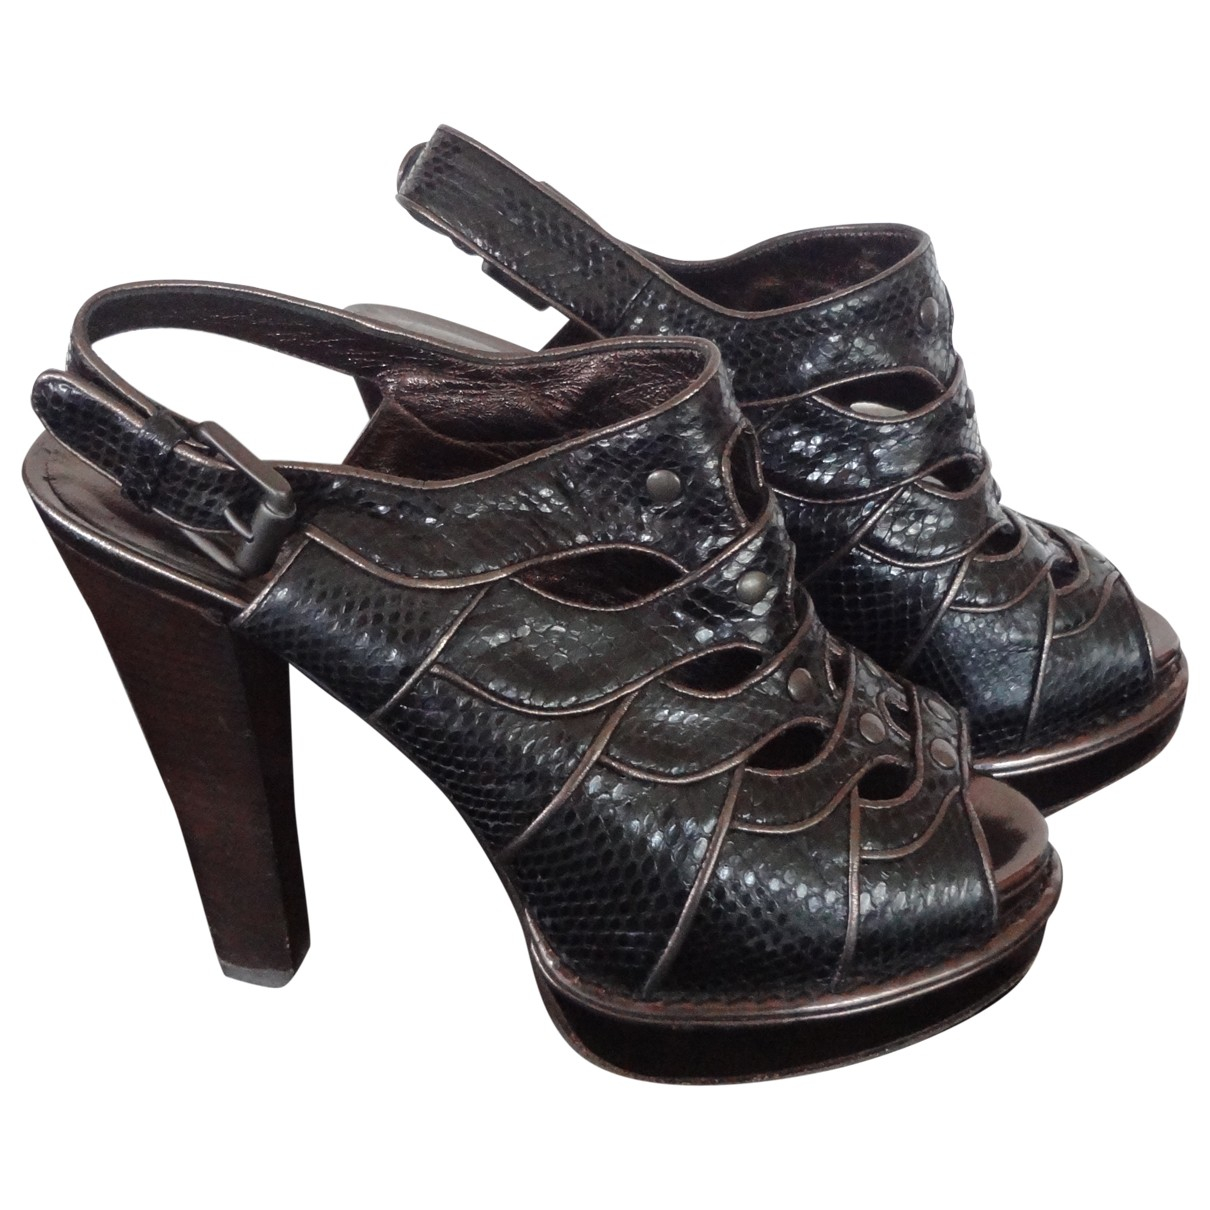 Bottega Veneta \N Brown Python Sandals for Women 37 EU